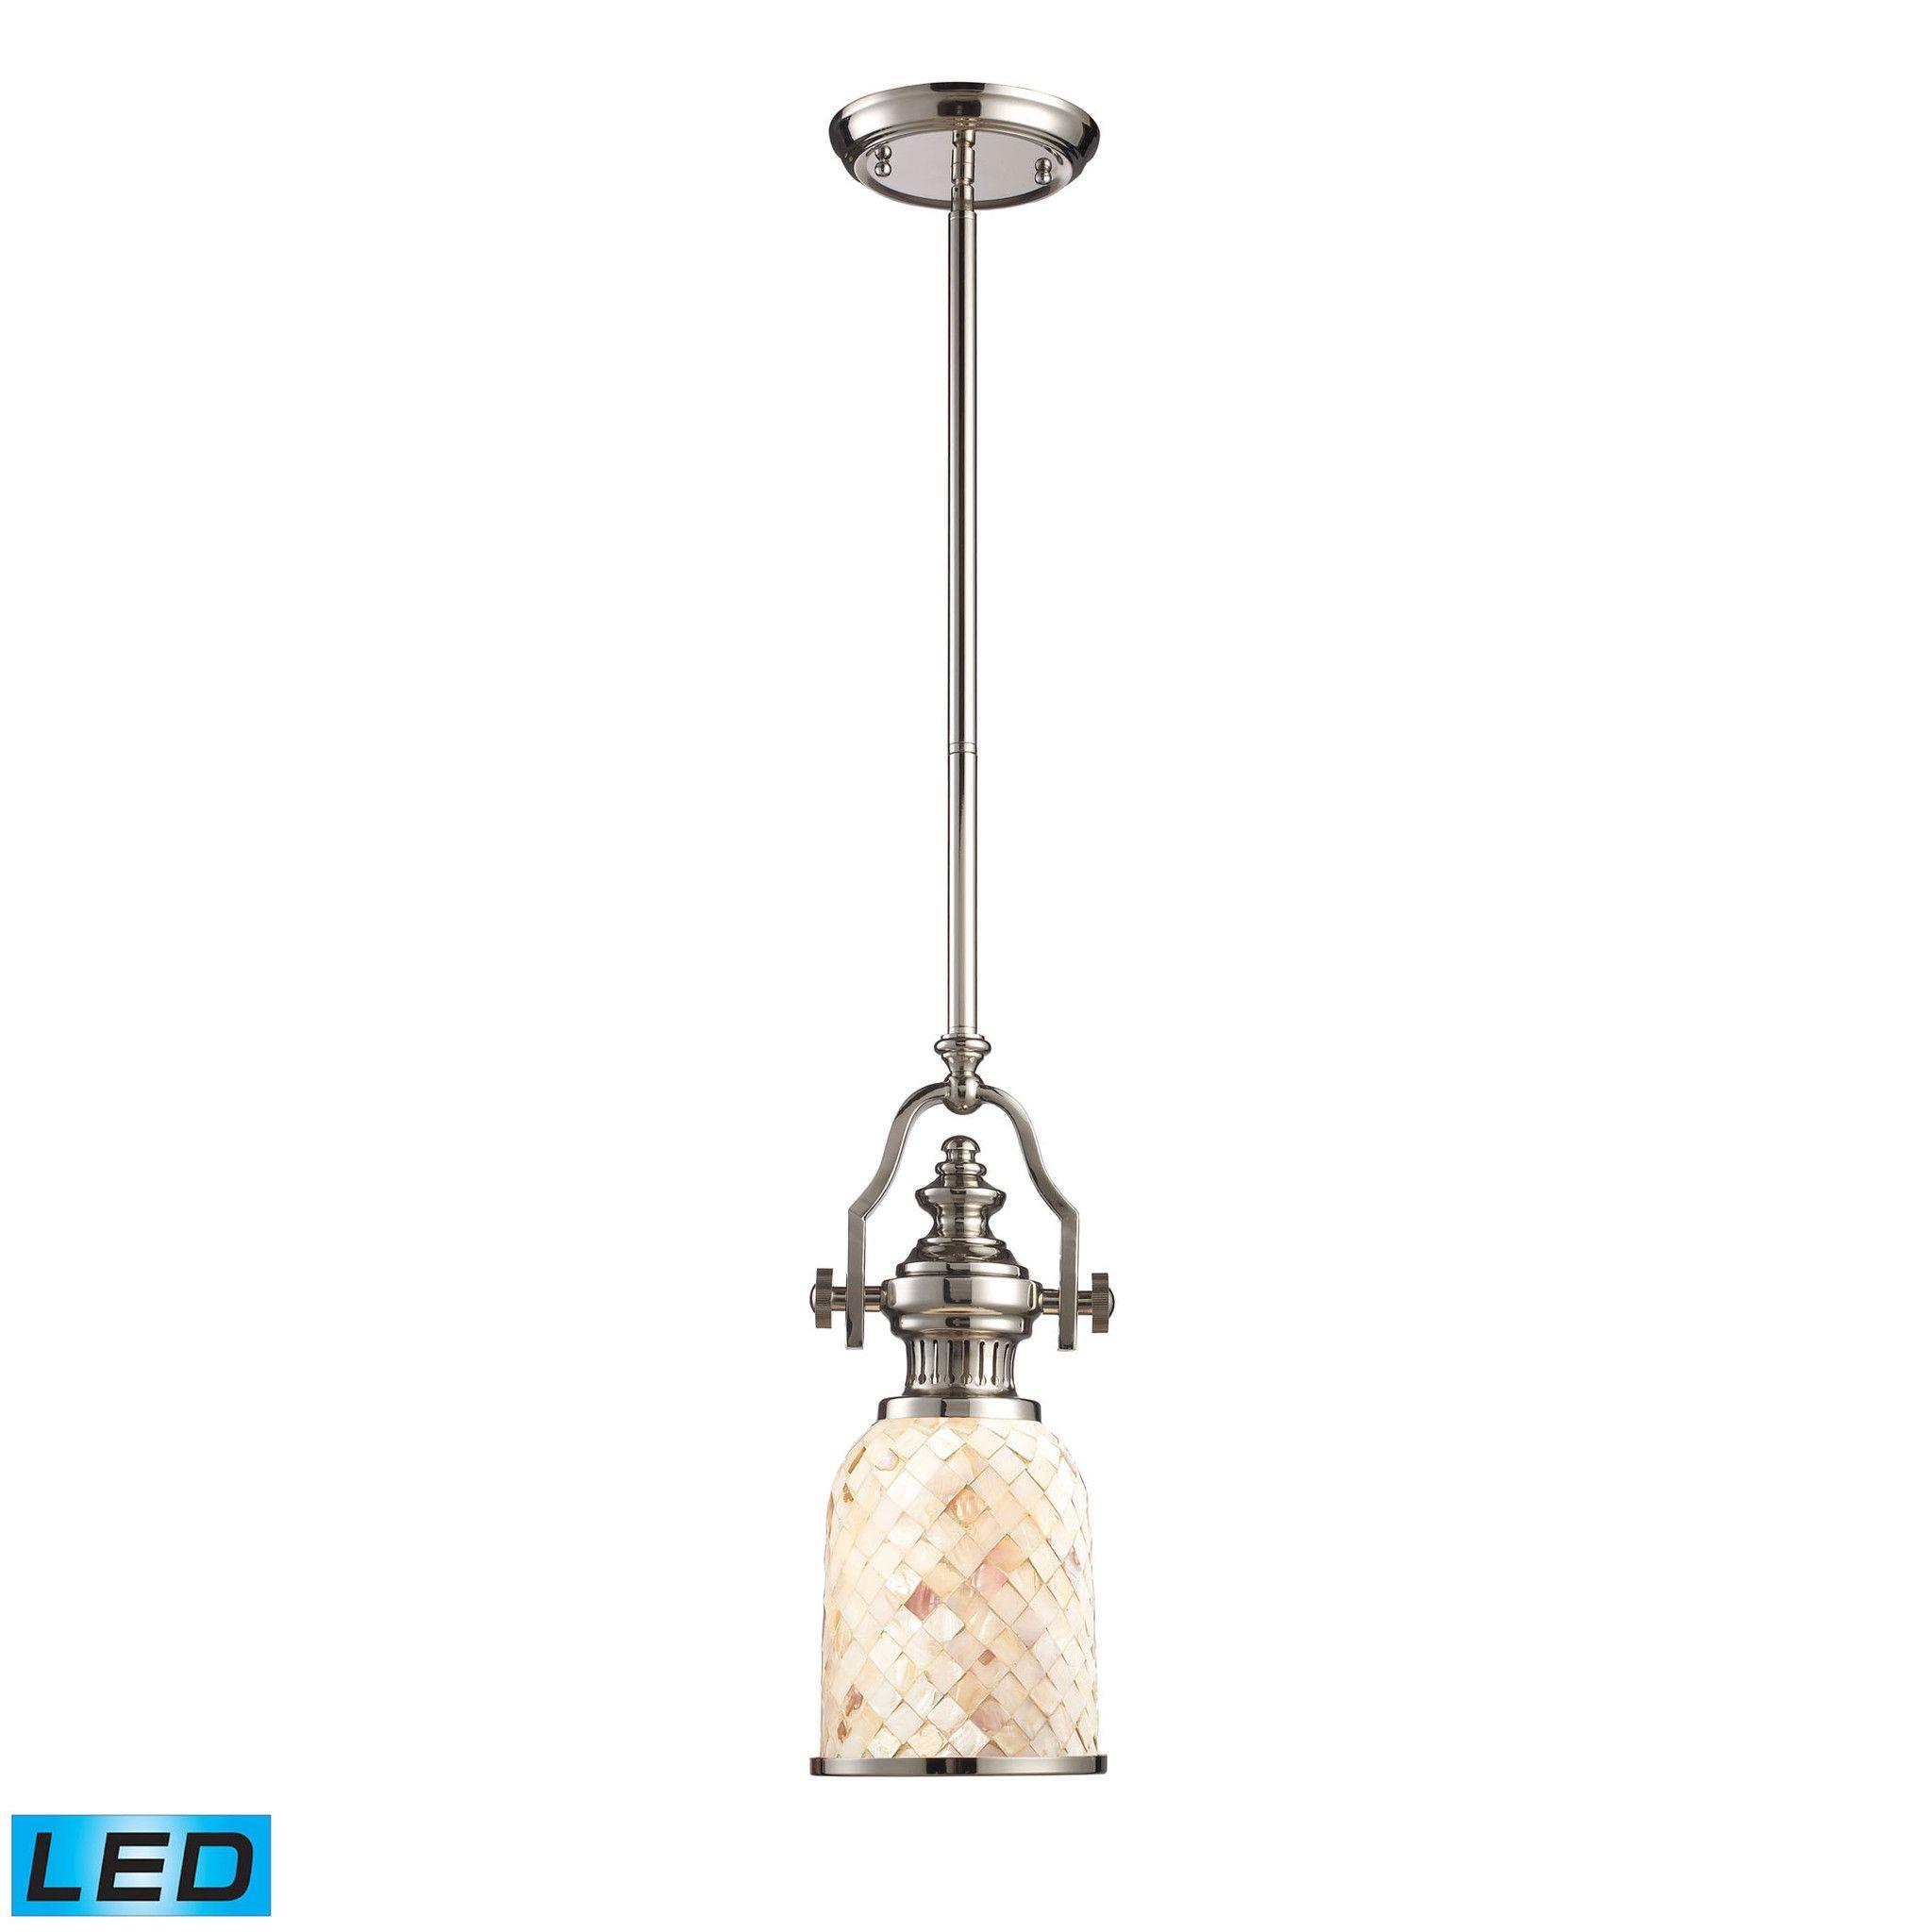 ELK Lighting 66412-1-LED Chadwick Collection Polished Nickel Finish